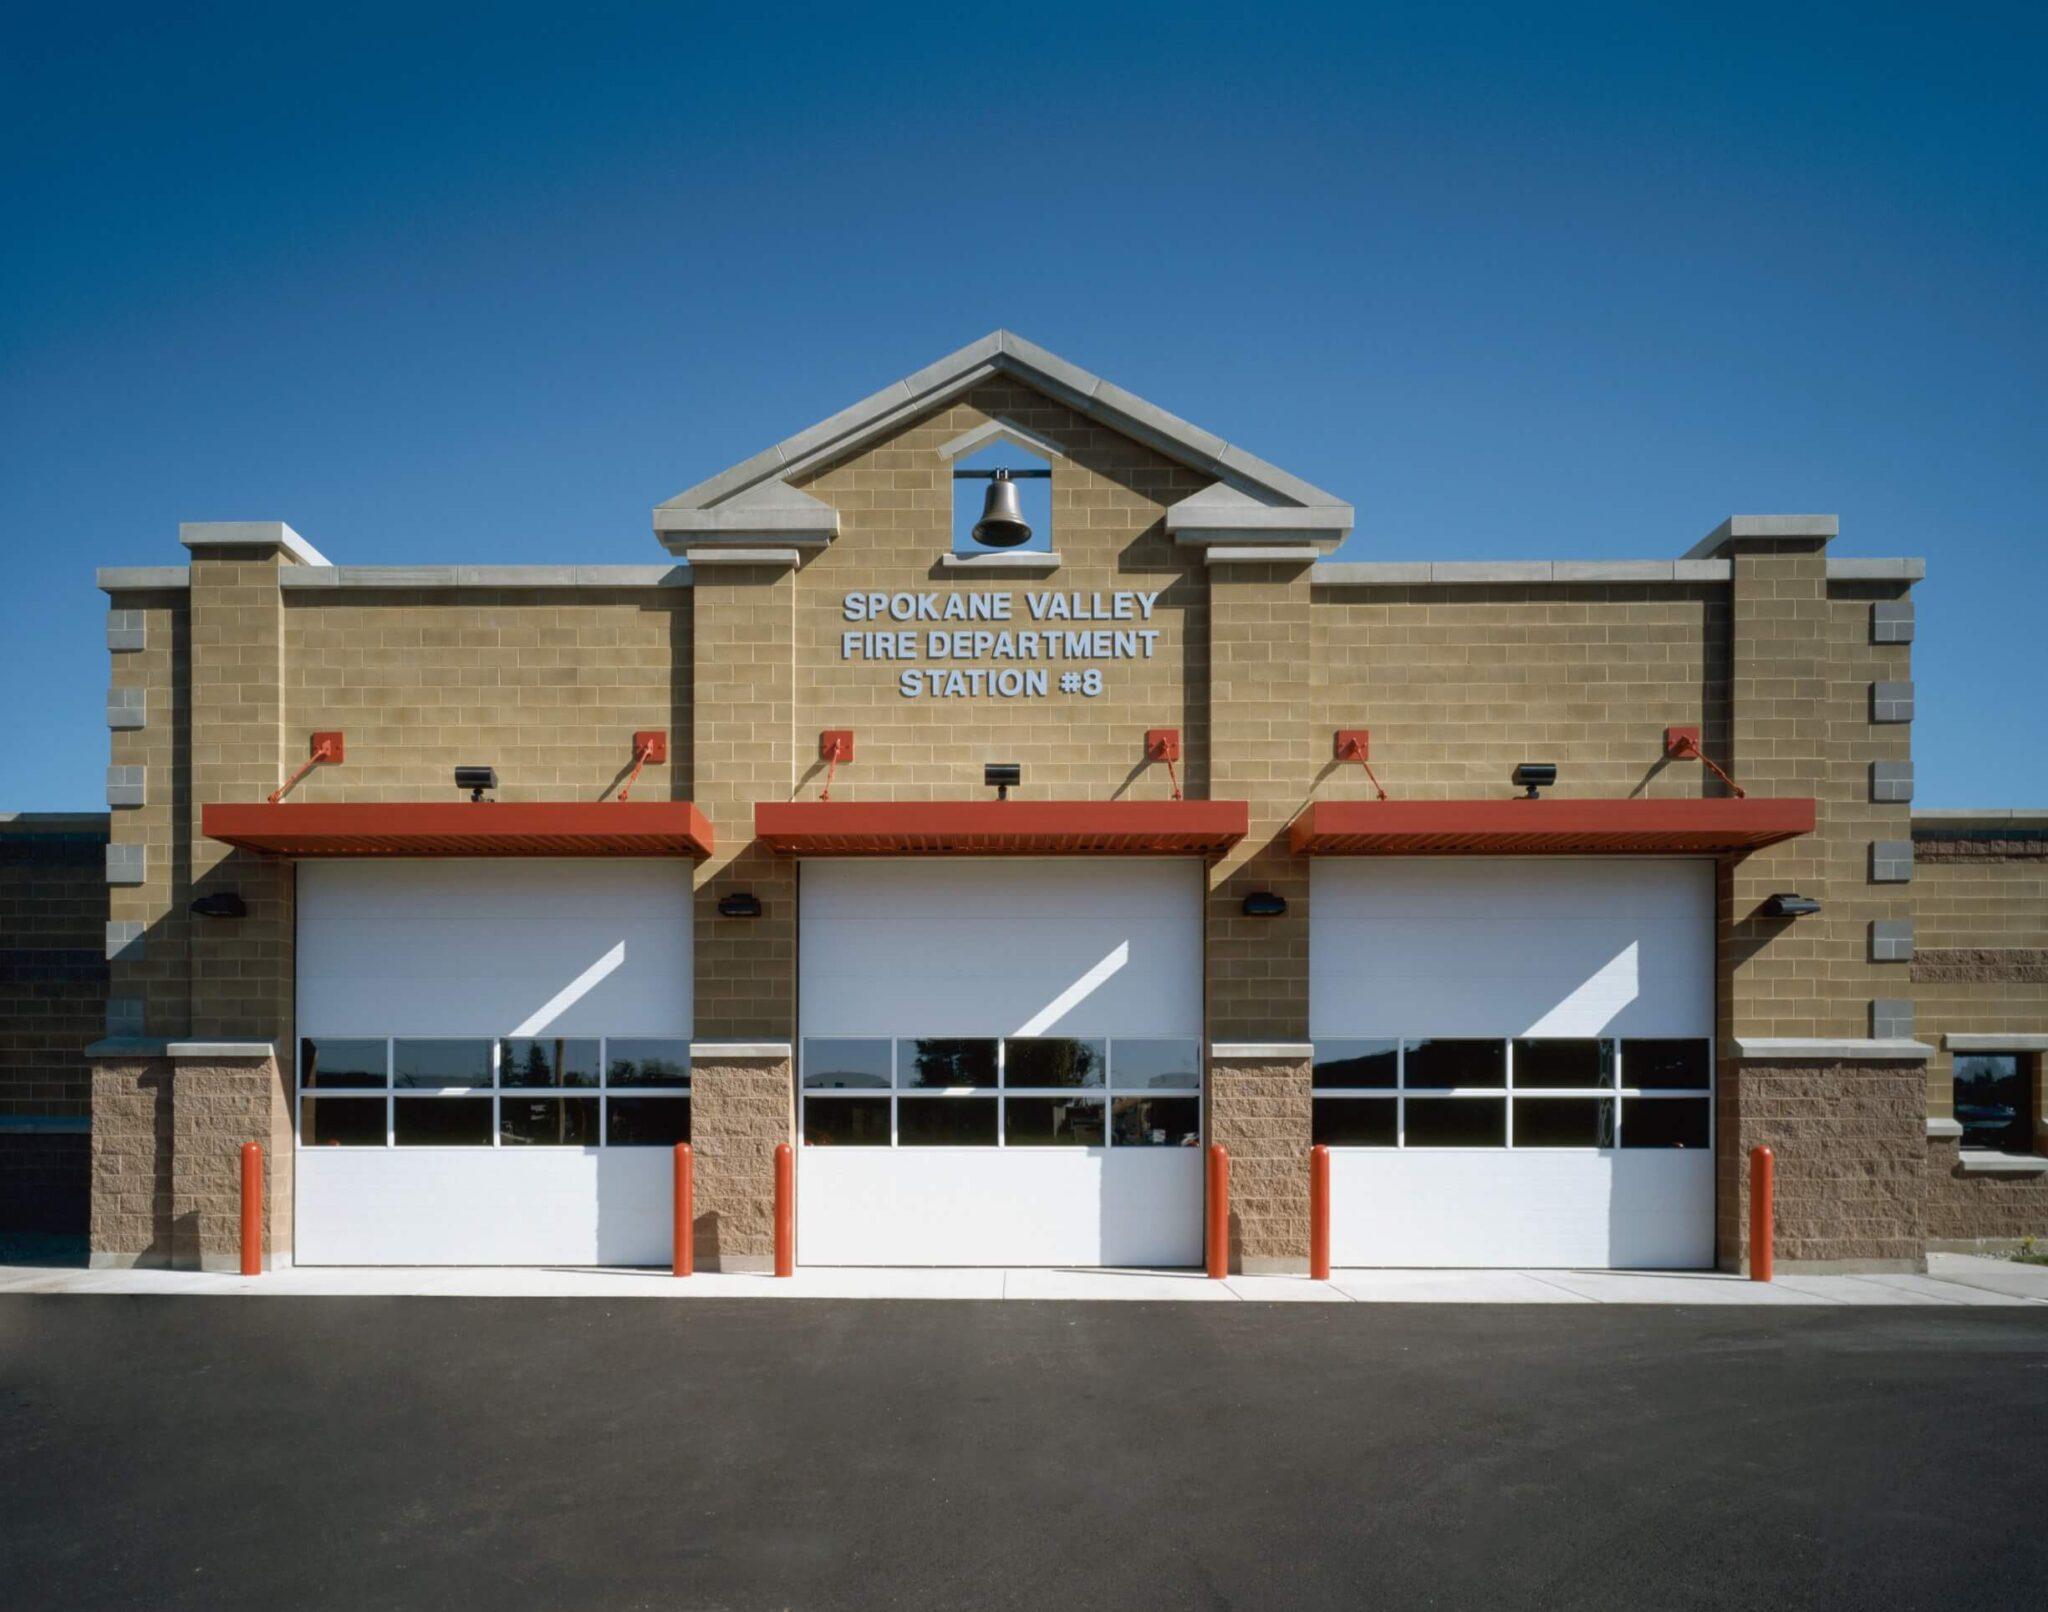 Fire Station No. 8